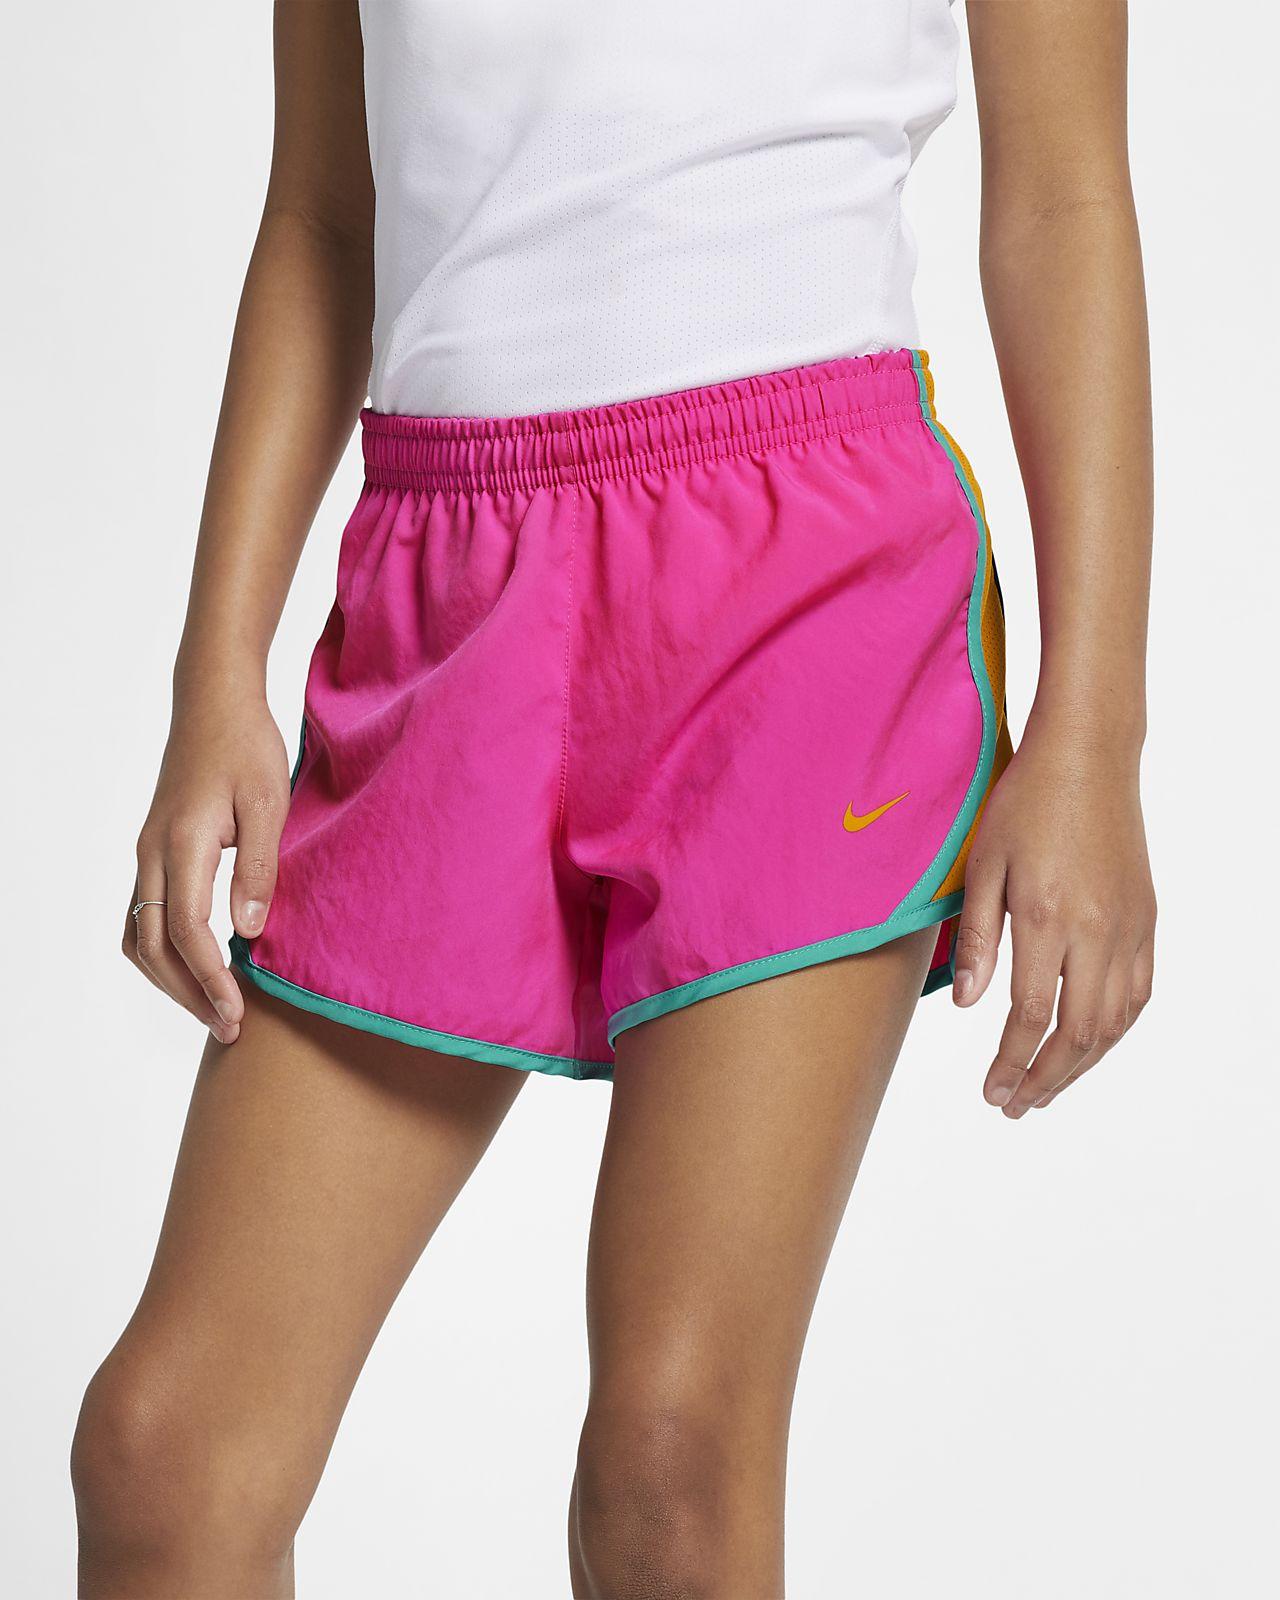 new products 7bc7e 110e2 ... Nike Dri-FIT Tempo Big Kids  (Girls ) Running Shorts